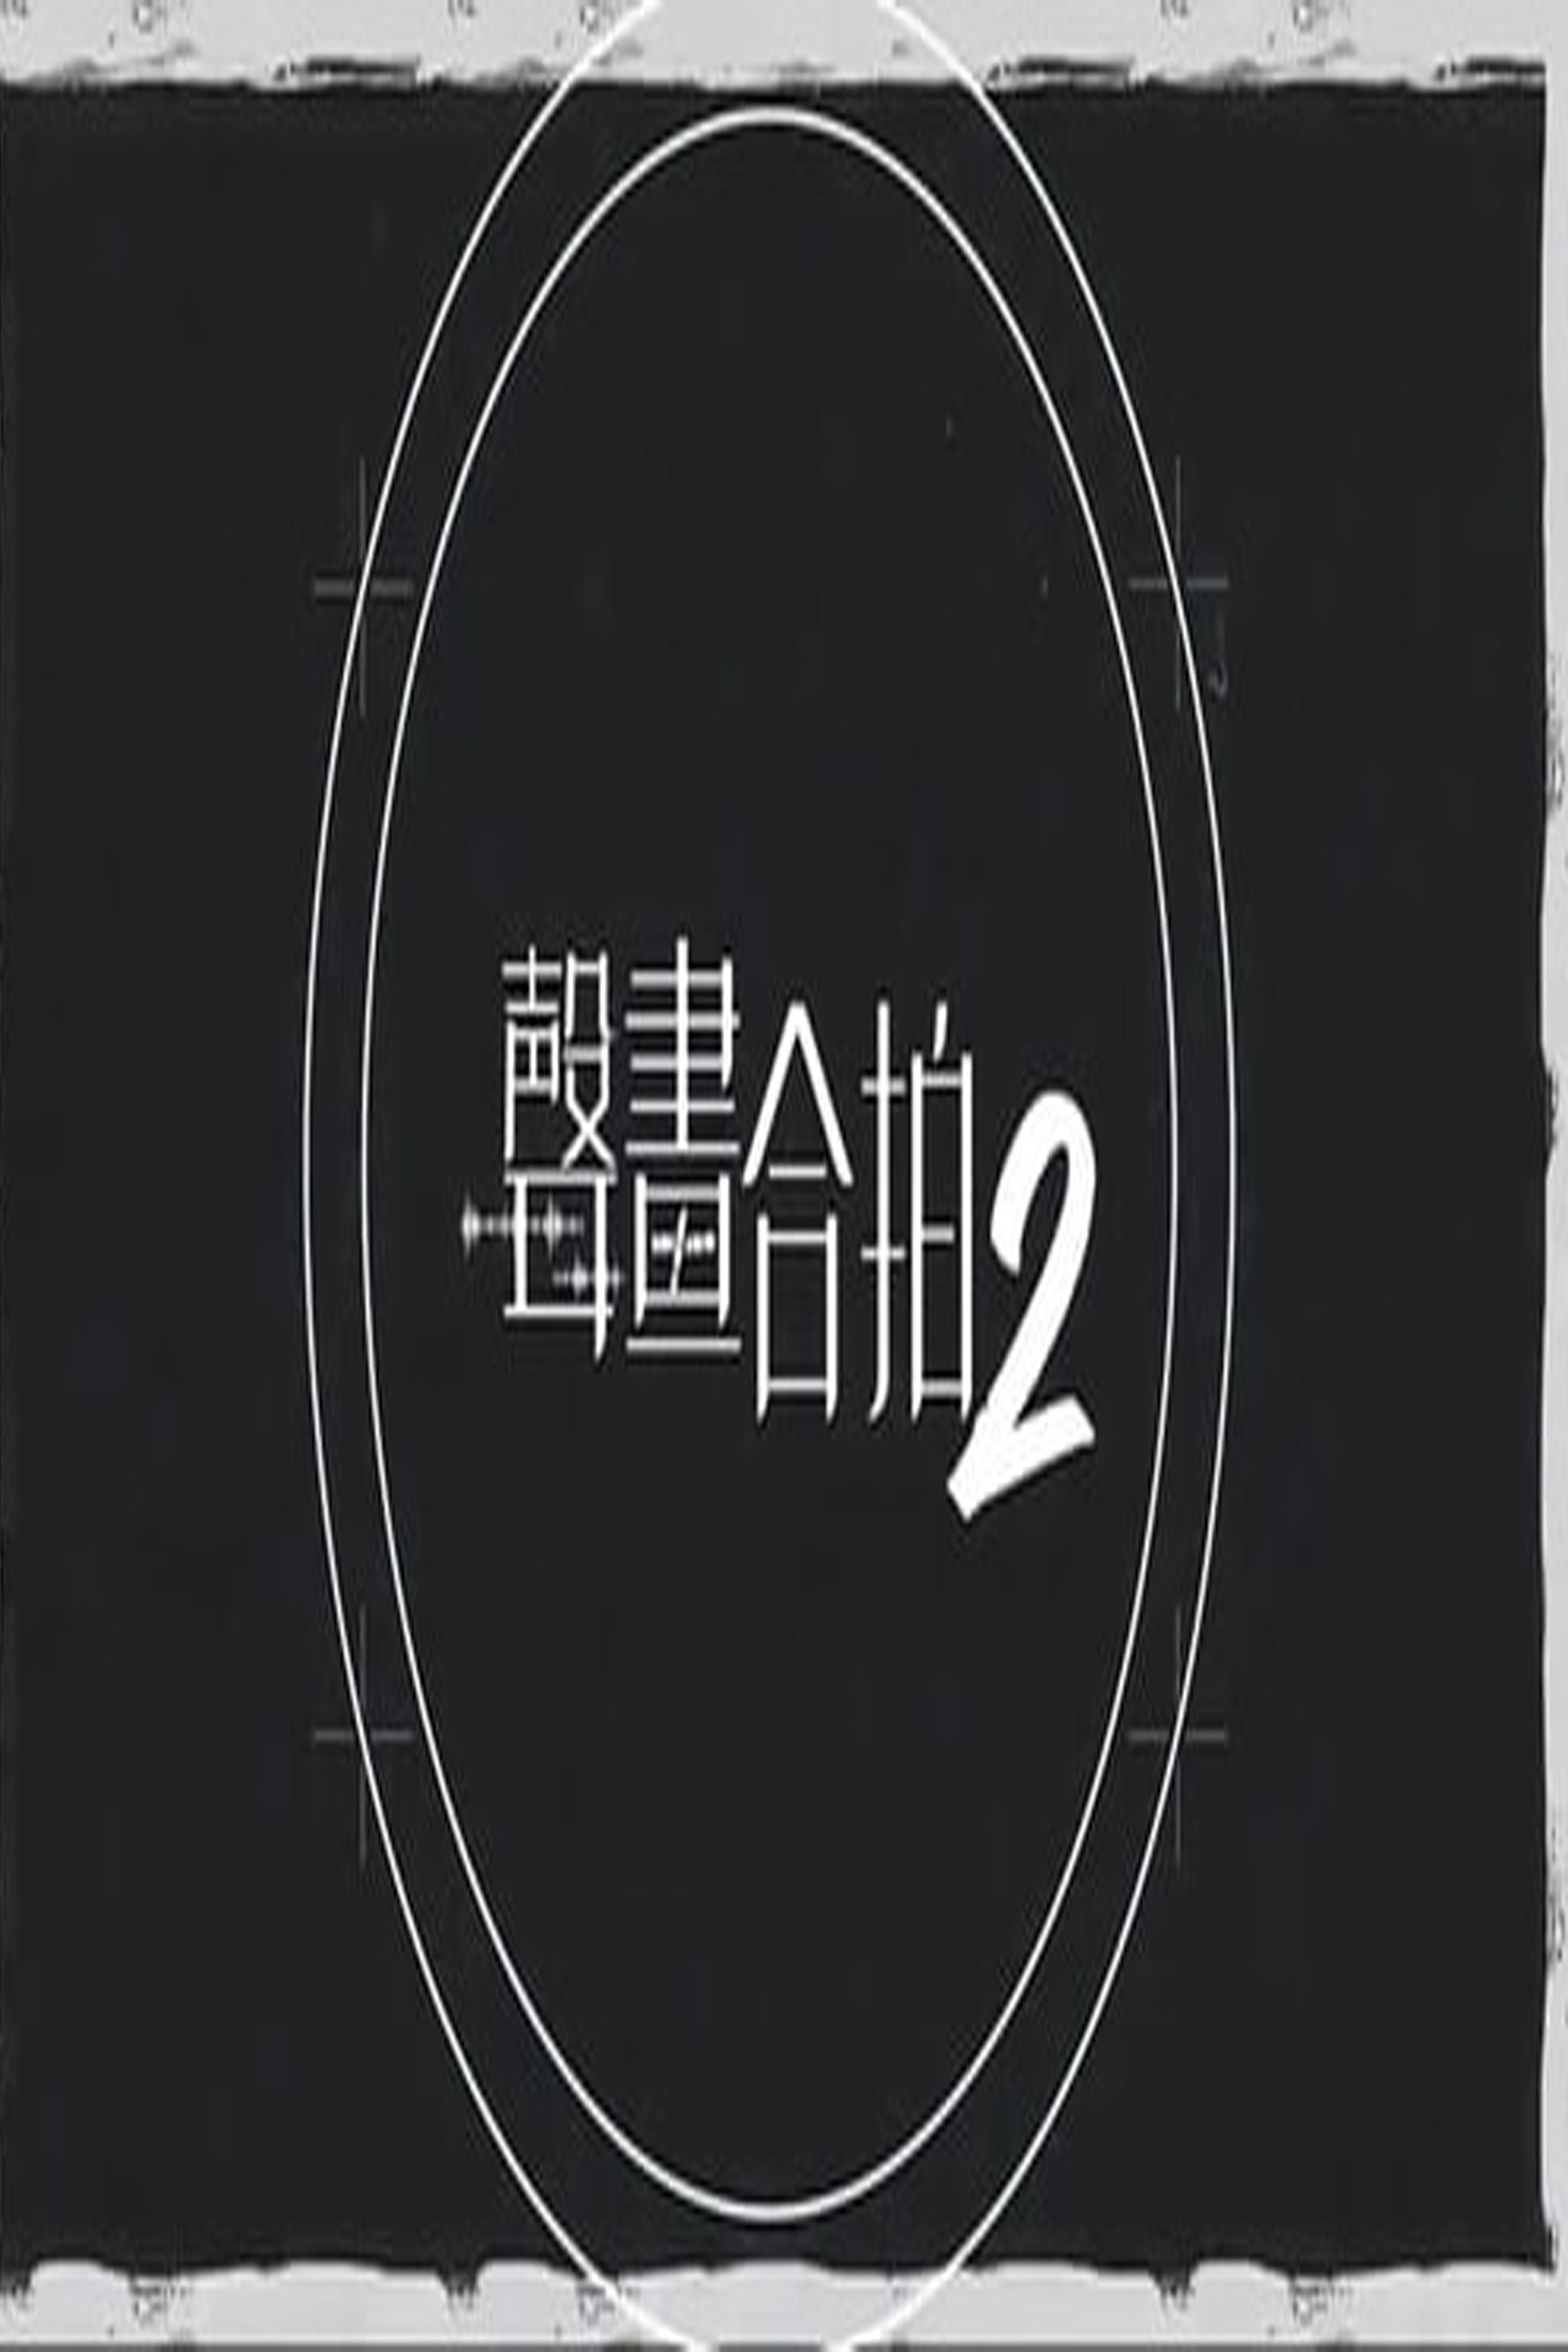 Sound and Vision S2 - 聲畫合拍 2